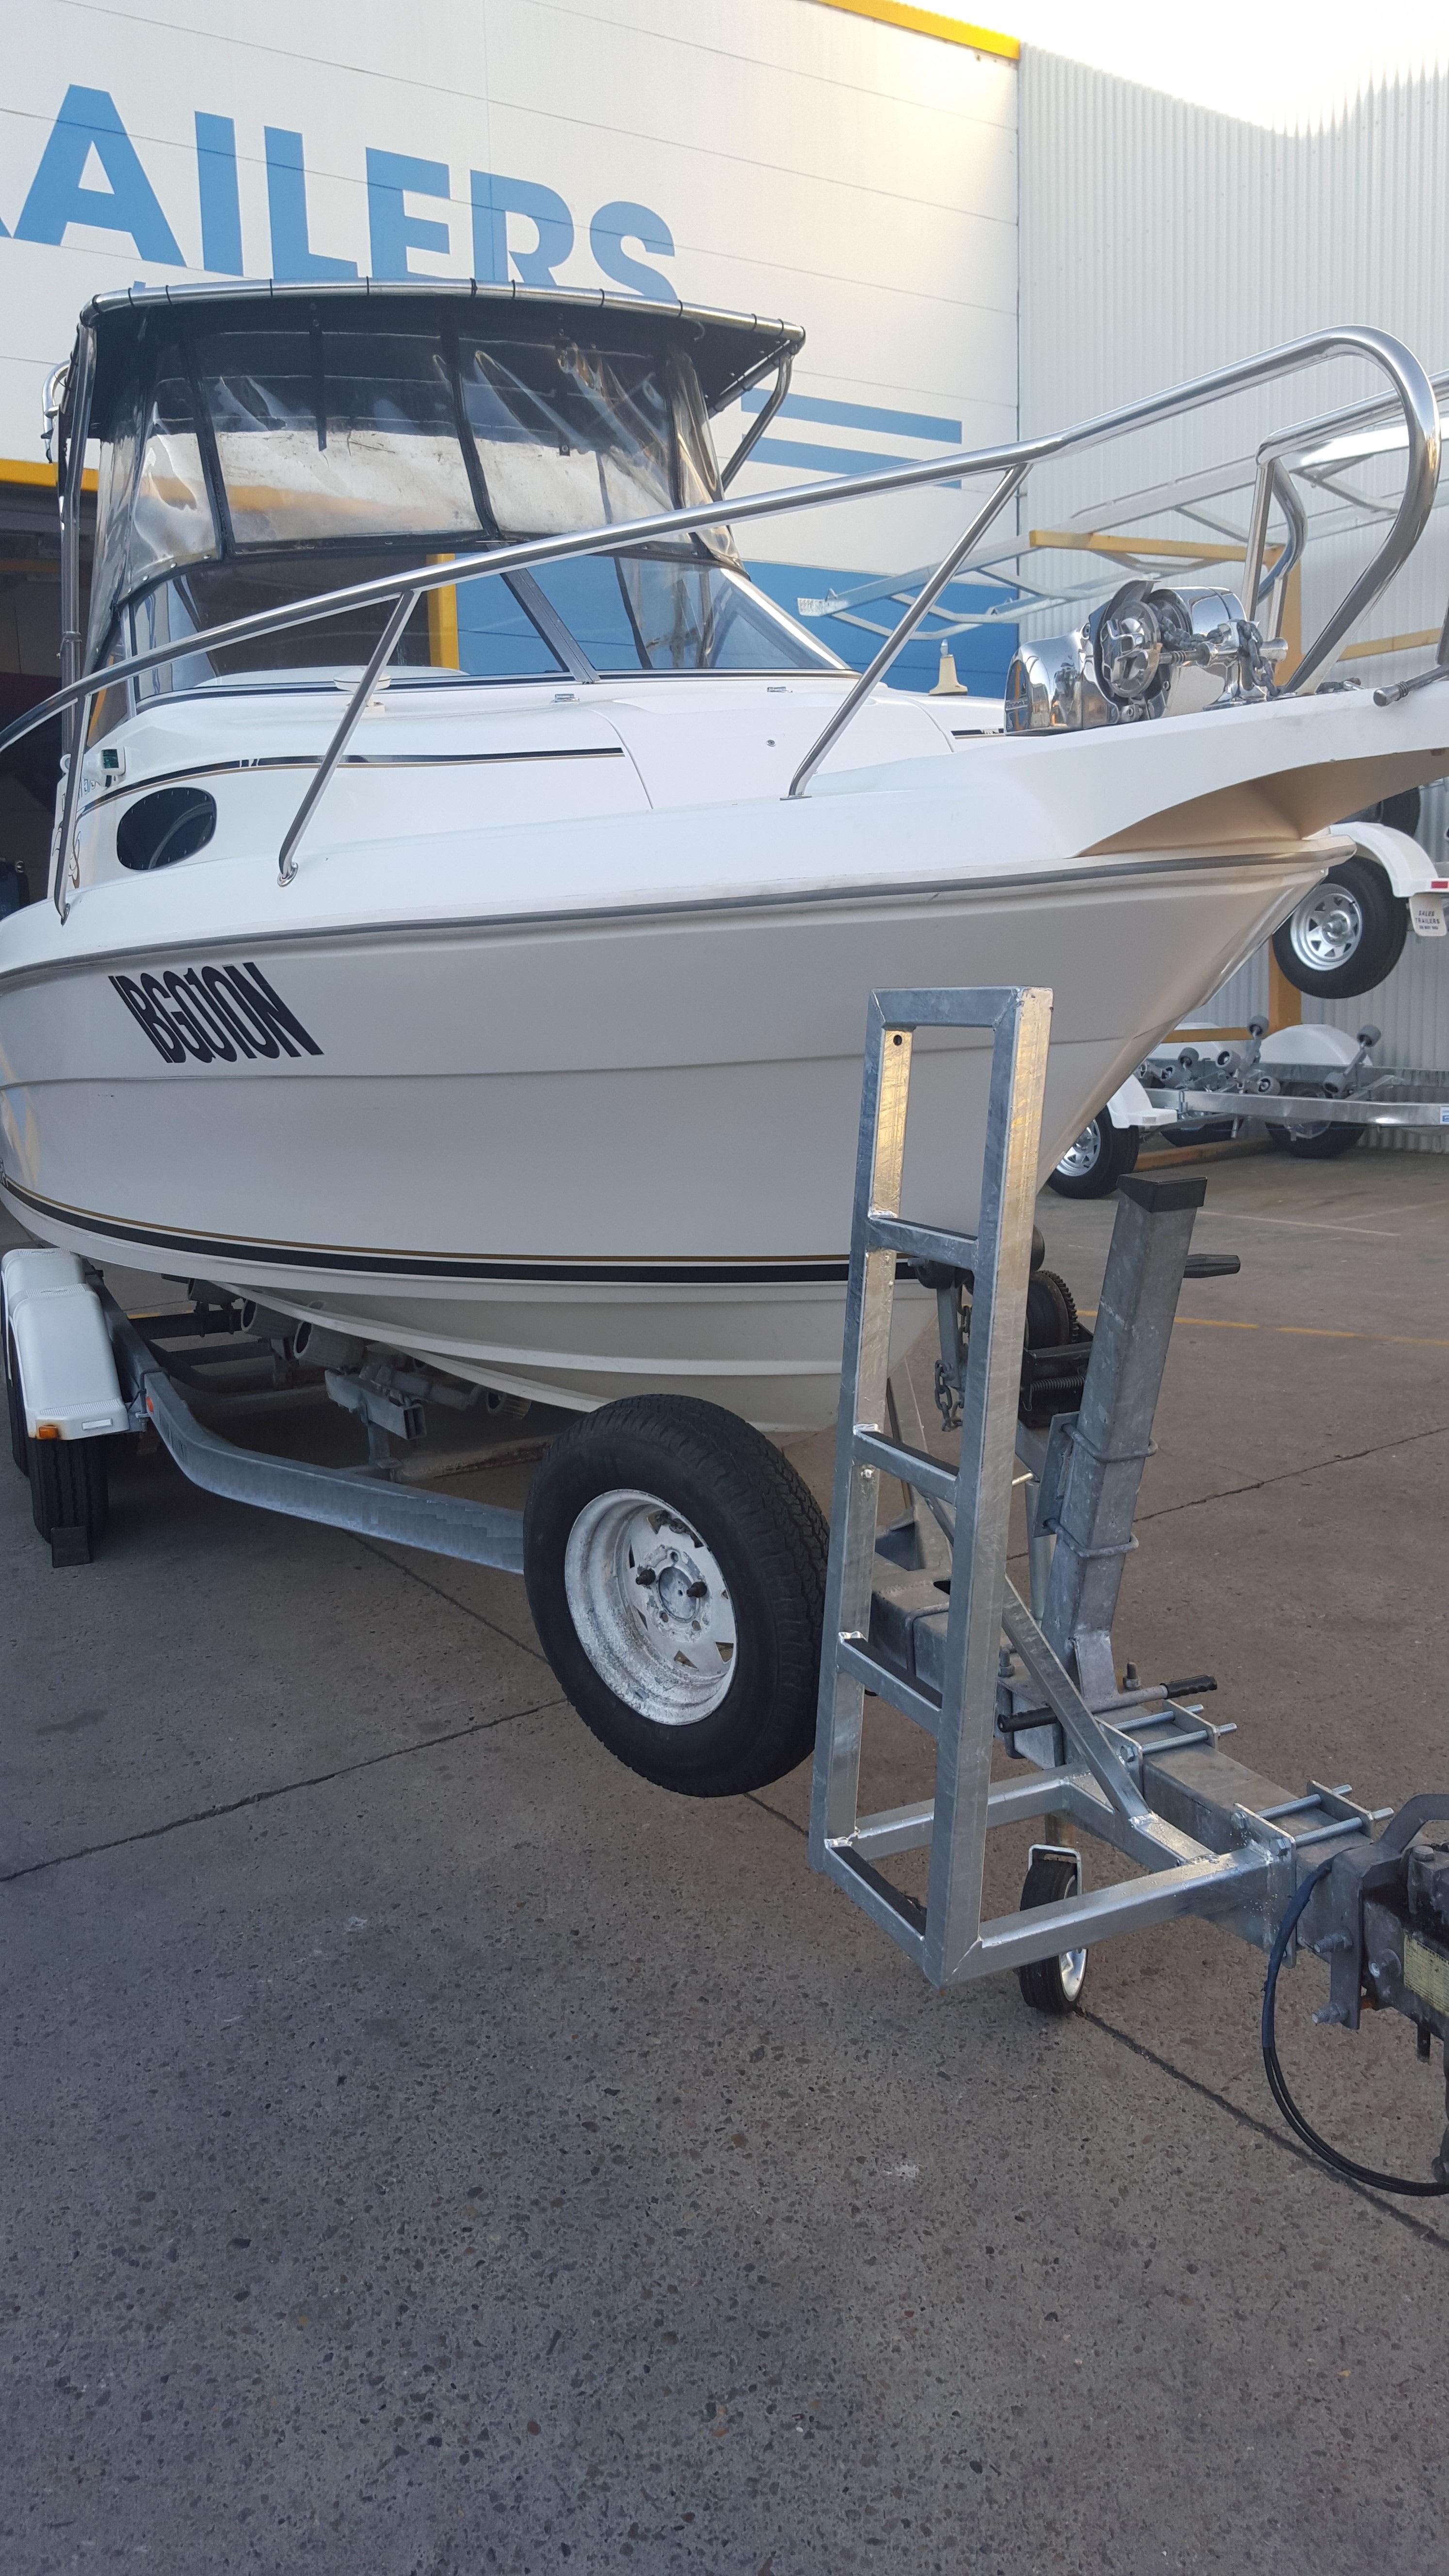 Boat Trailer Ladder 187 Sales Trailers Sydney